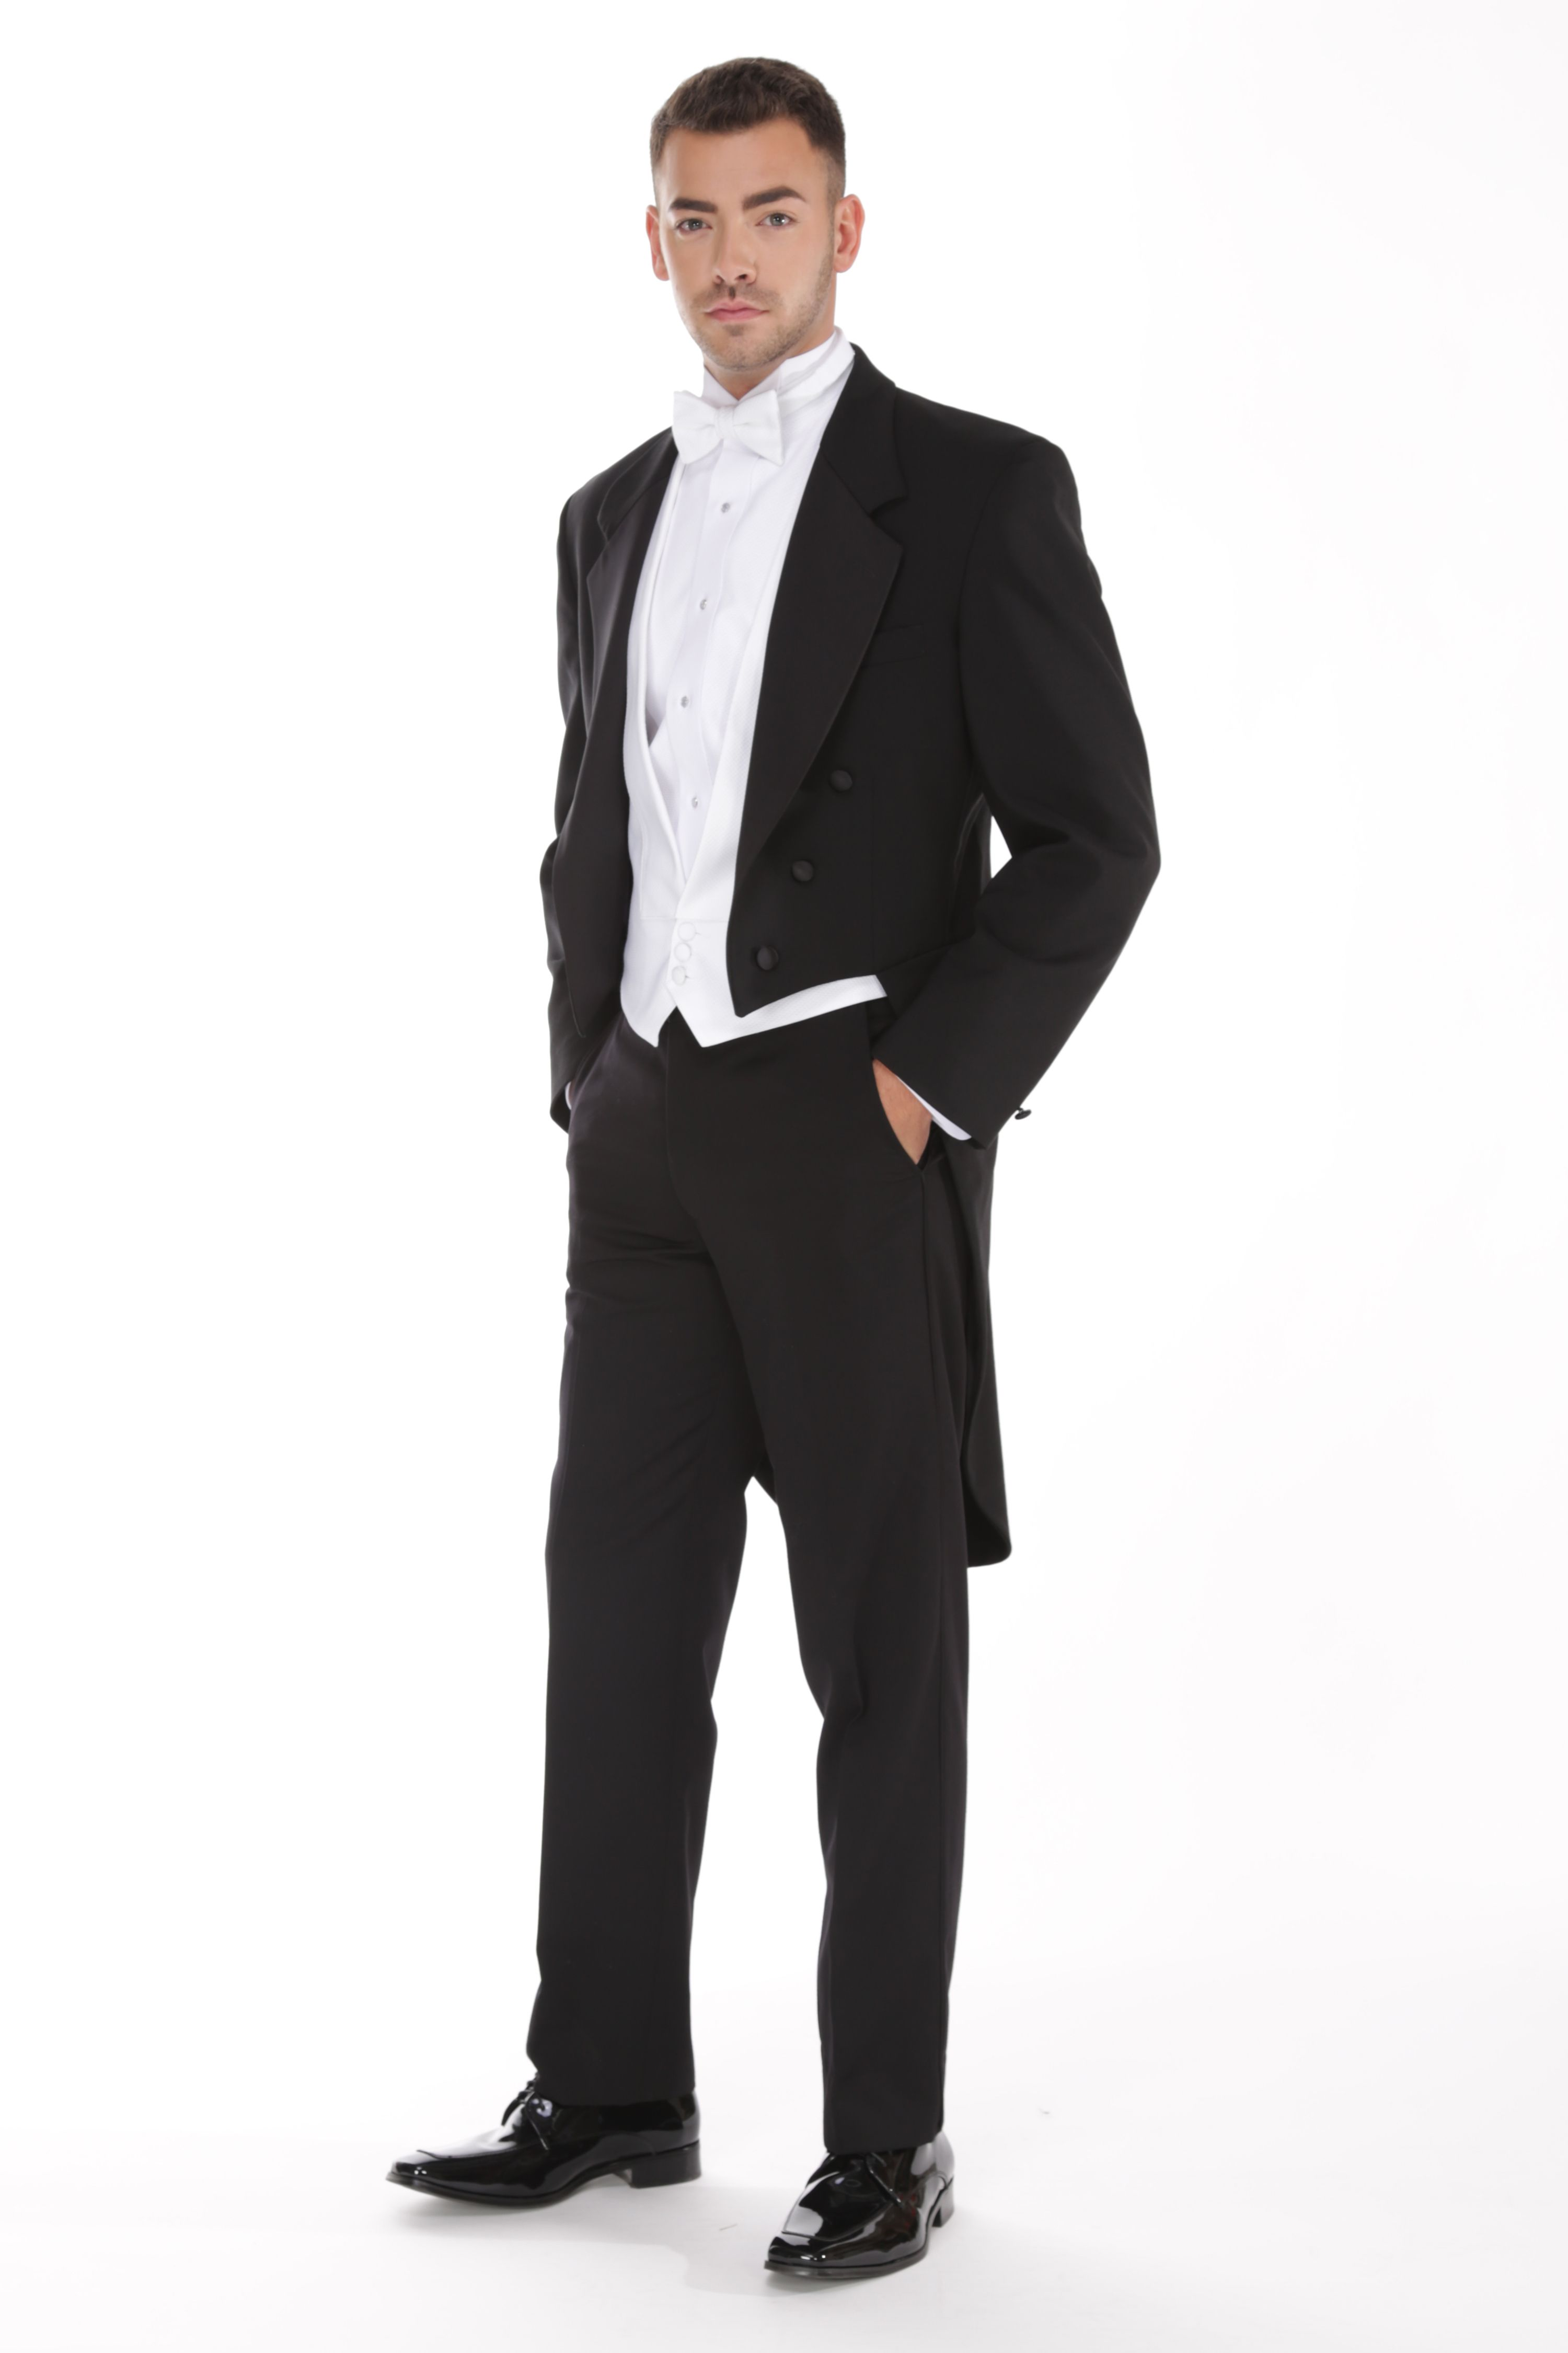 Traditional Full Dress Notch Tuxedo with tails, Tuxedo